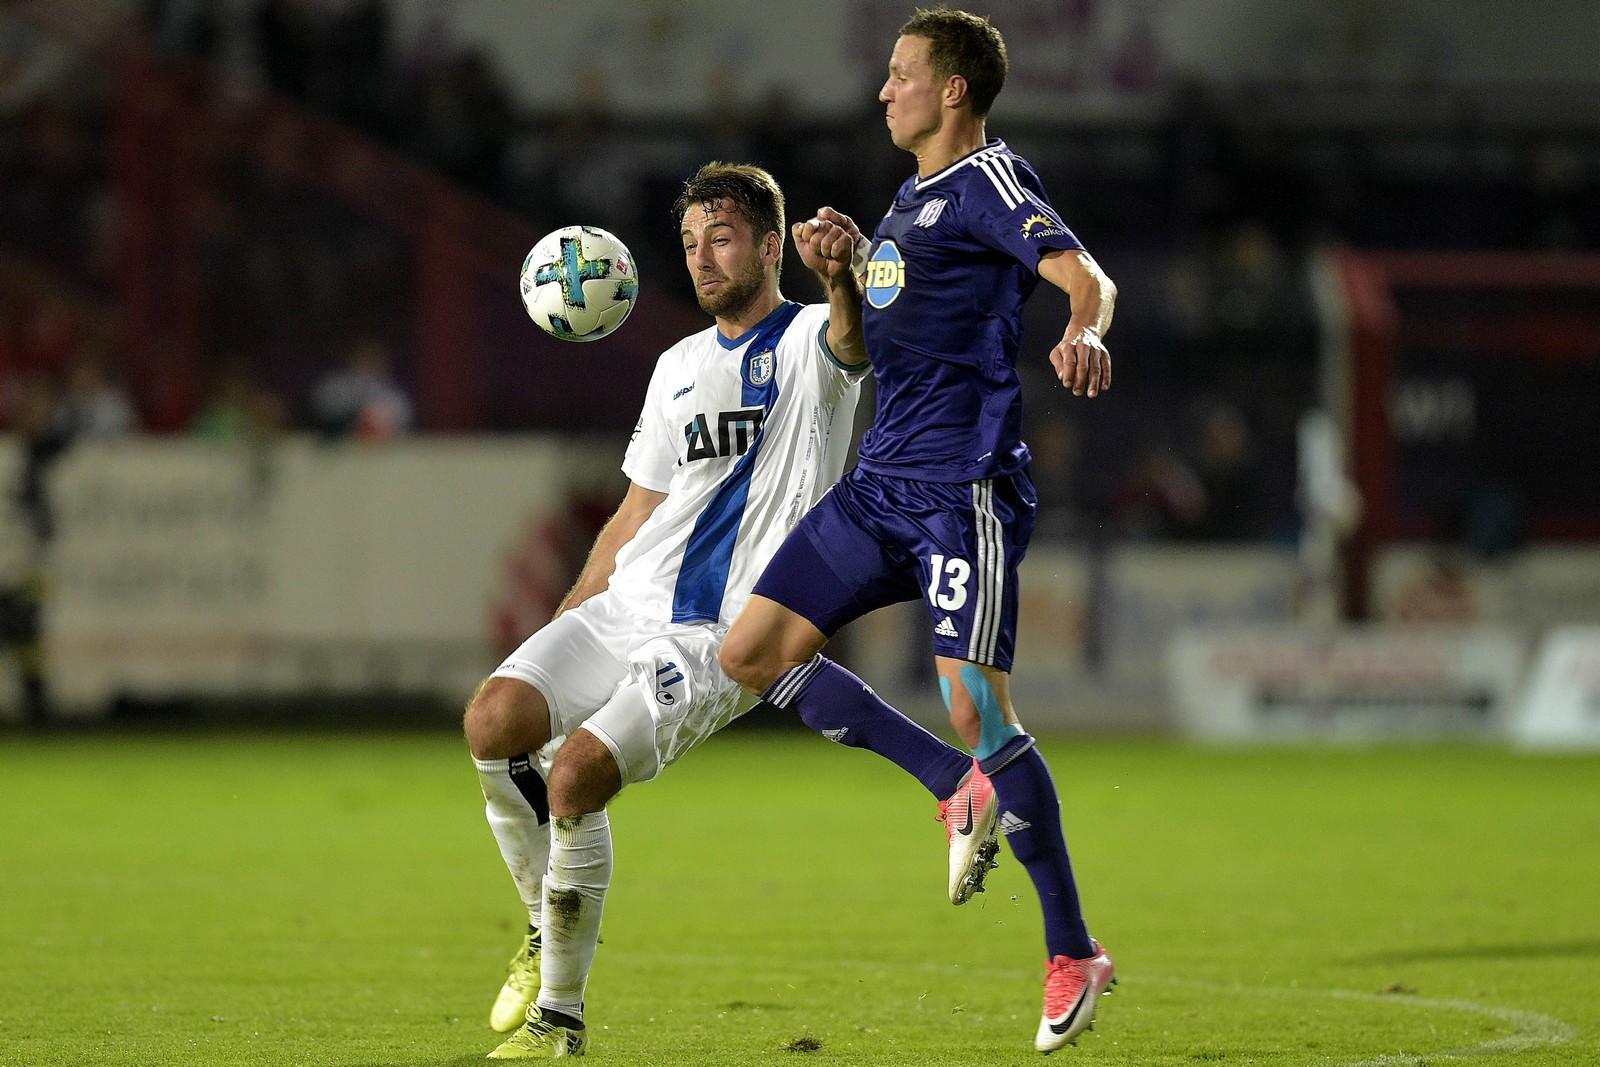 Christian Beck vom 1. FC Magdeburg gegen Tim Danneberg vom VfL Osnabrück